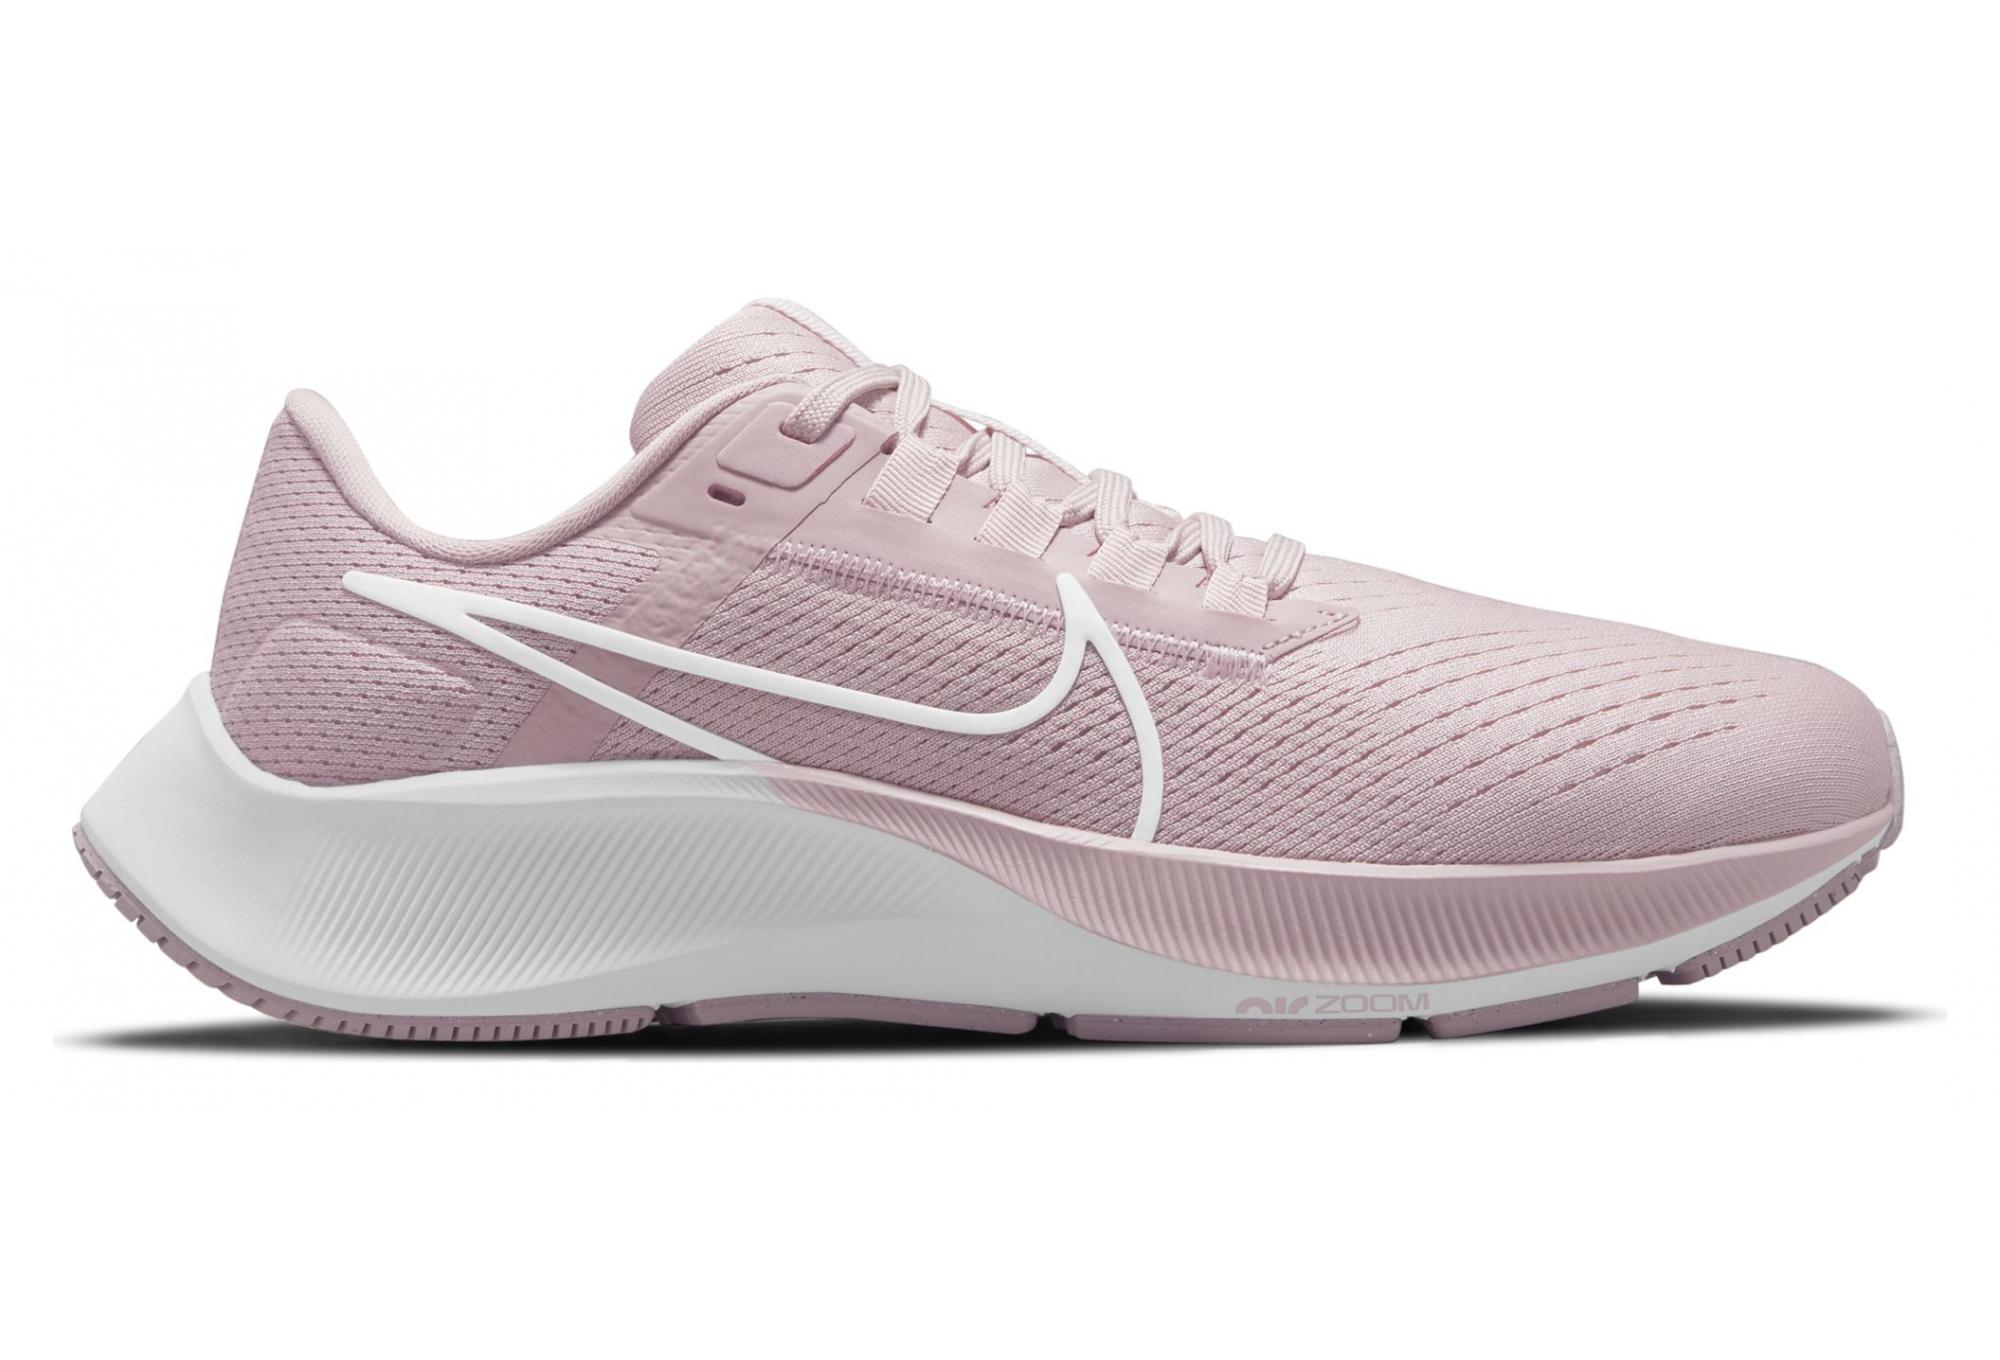 Chaussures de Running Femme Nike Air Zoom Pegasus 38 Rose / Blanc ...